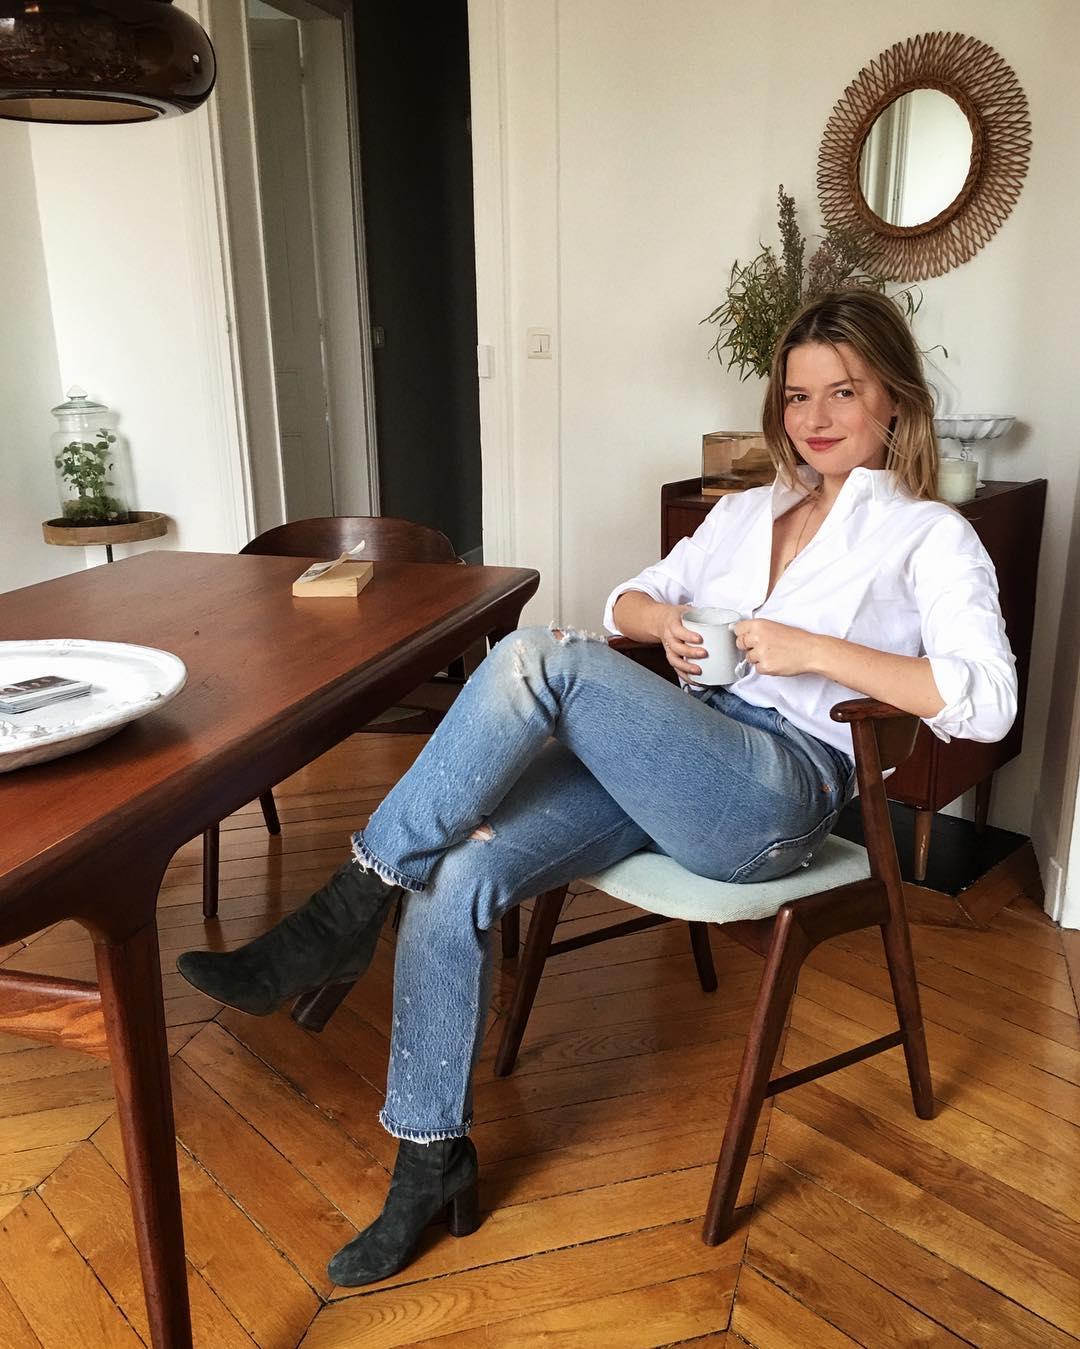 French wardrobe basics, Parisian wardrobe basics, Sabina Socol